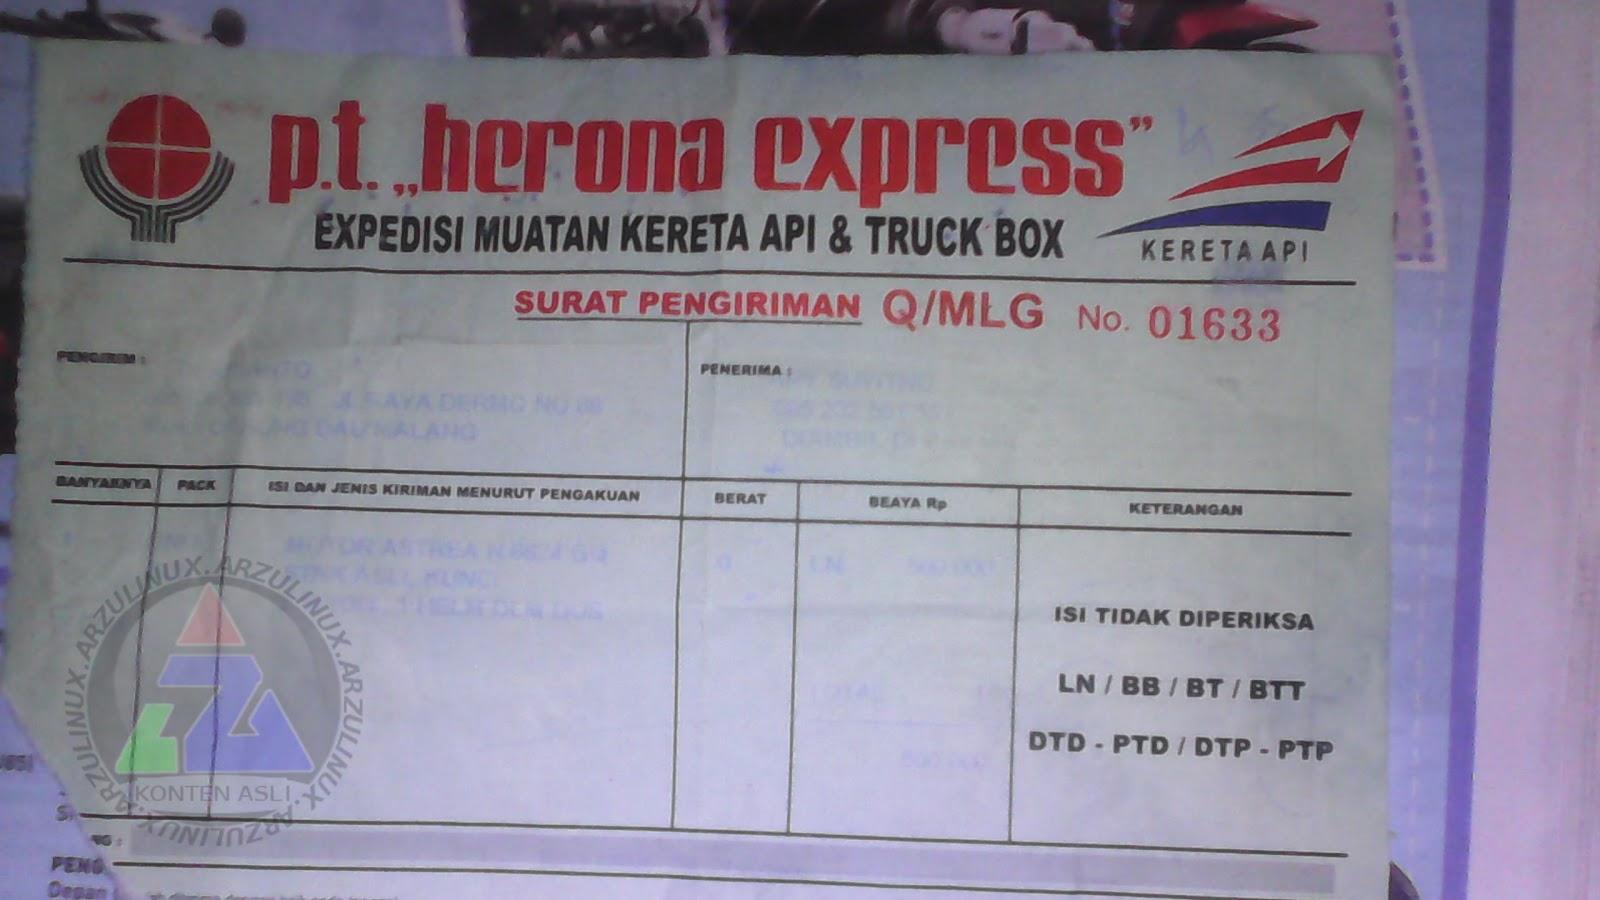 Pengalaman Menggunakan Jasa Pt Herona Express Untuk Kirim